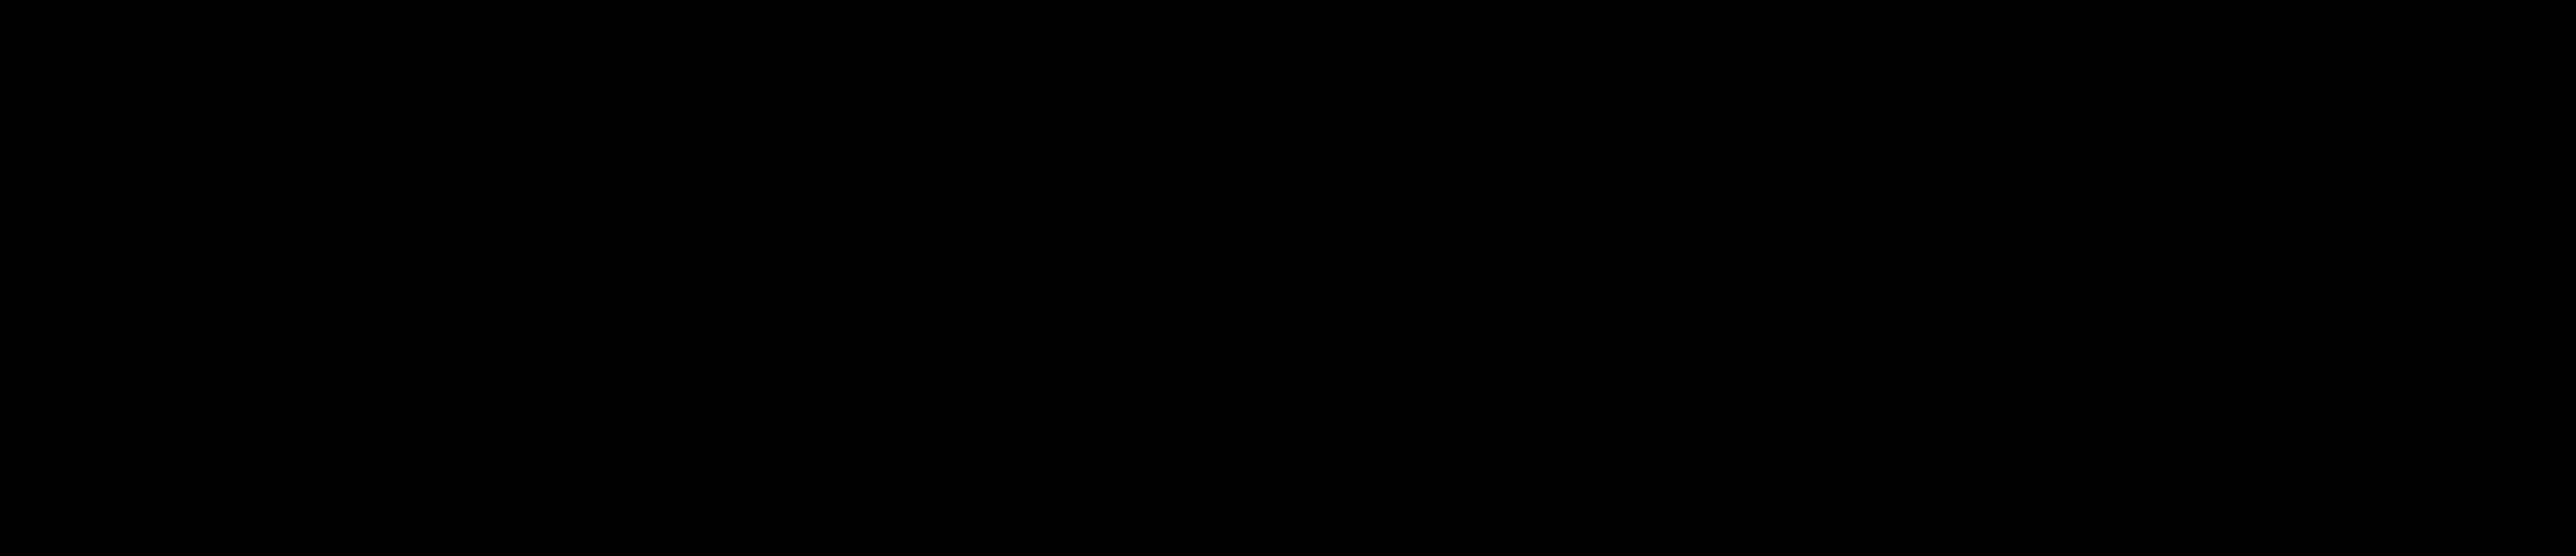 Software Audit Process Chart